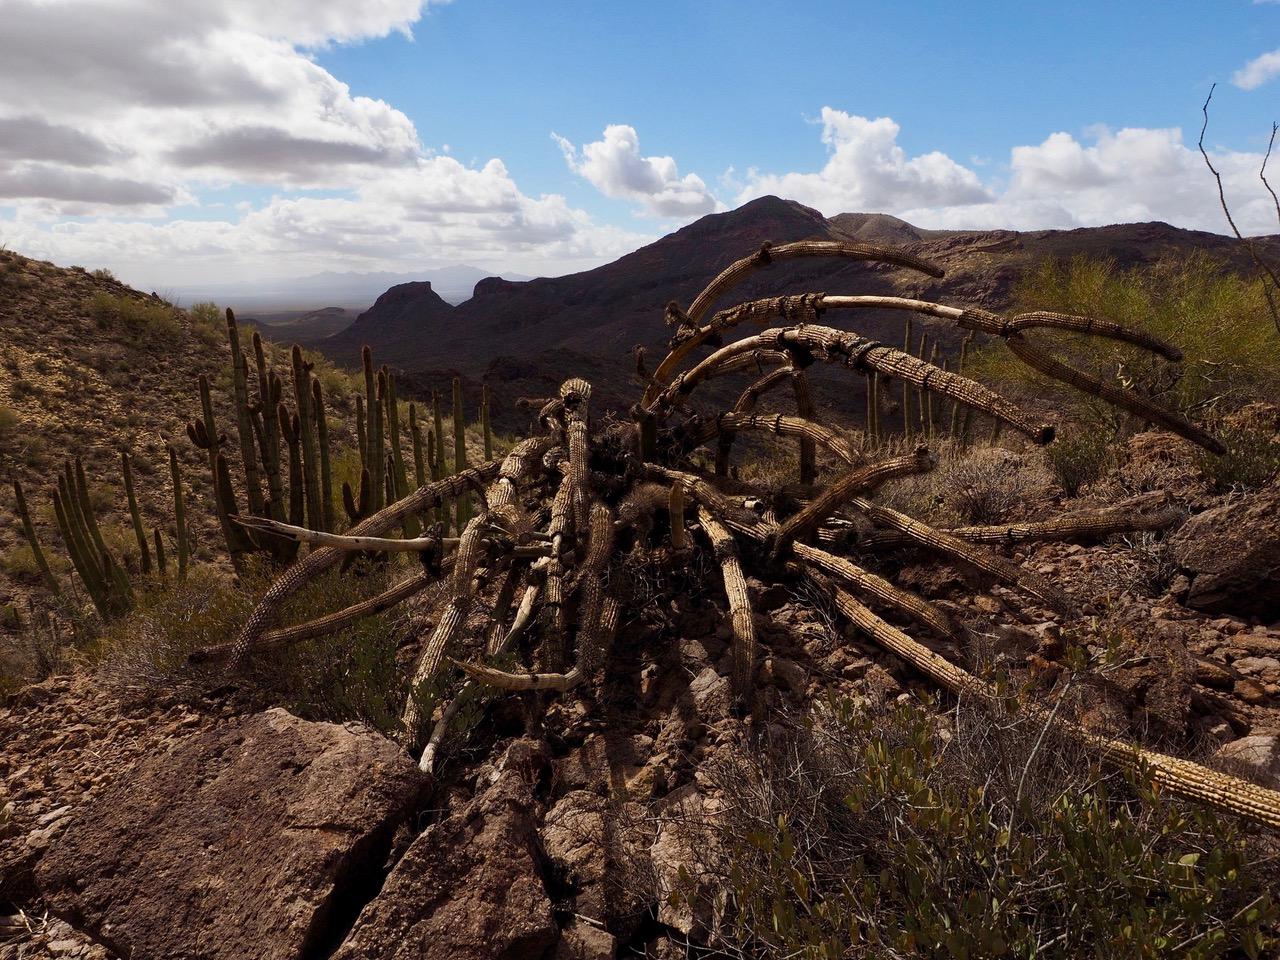 O15-dead organ pipe cactus-P2196588.jpg